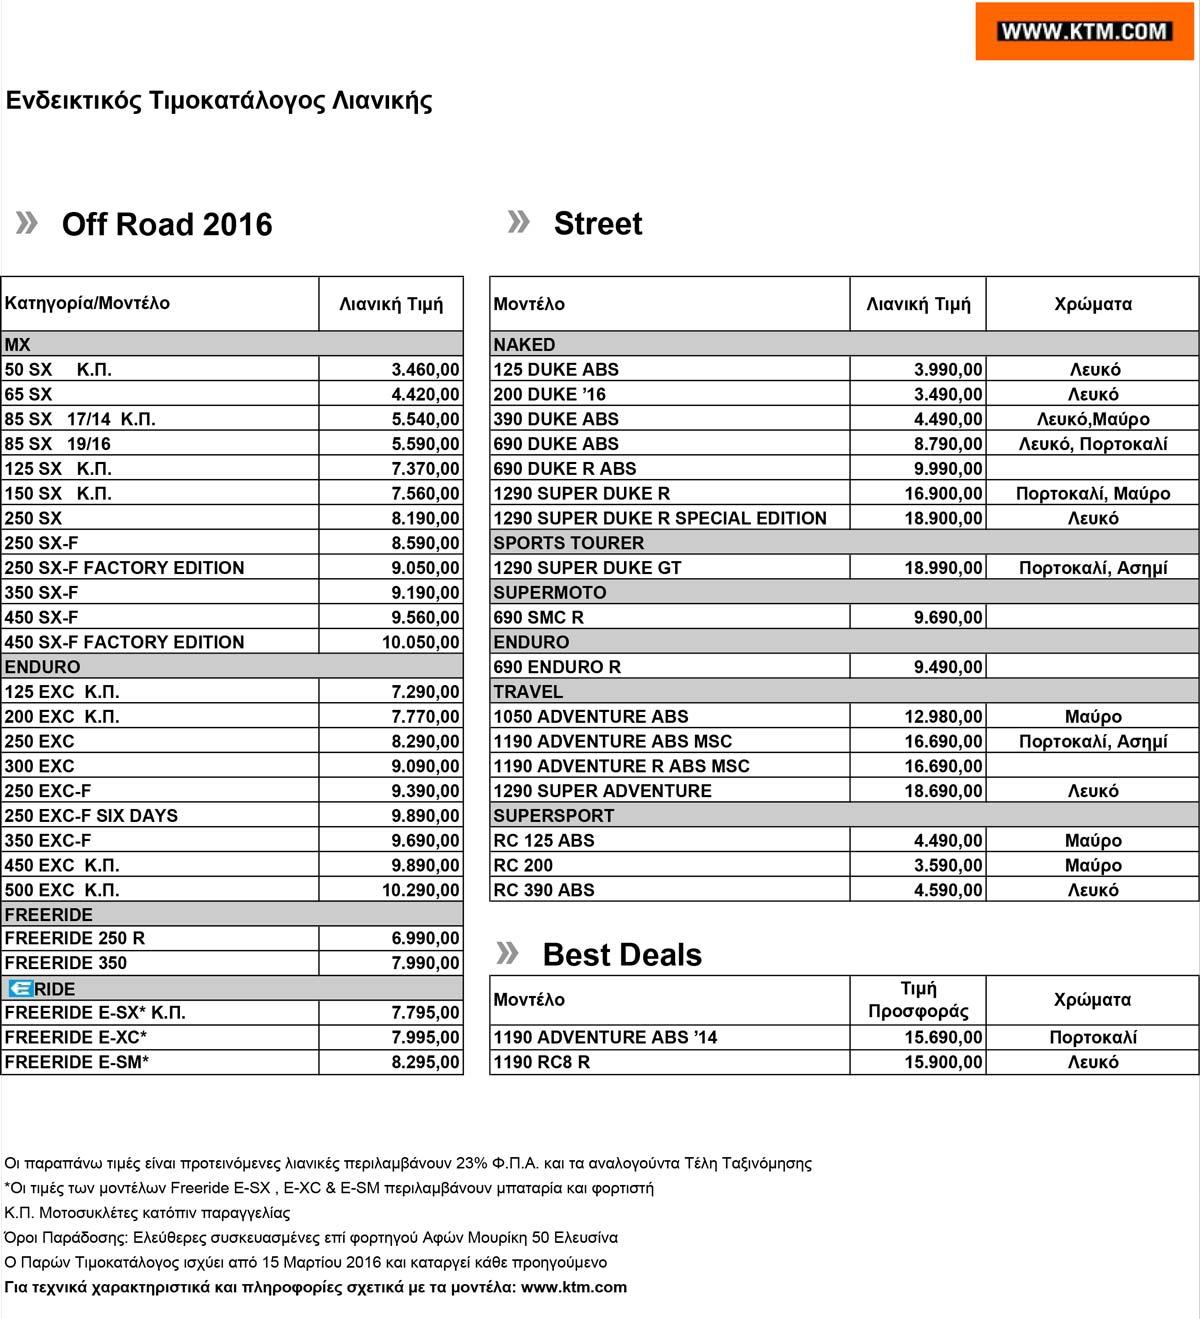 KTM-Retail-Pricelist_2016_15_03_2016